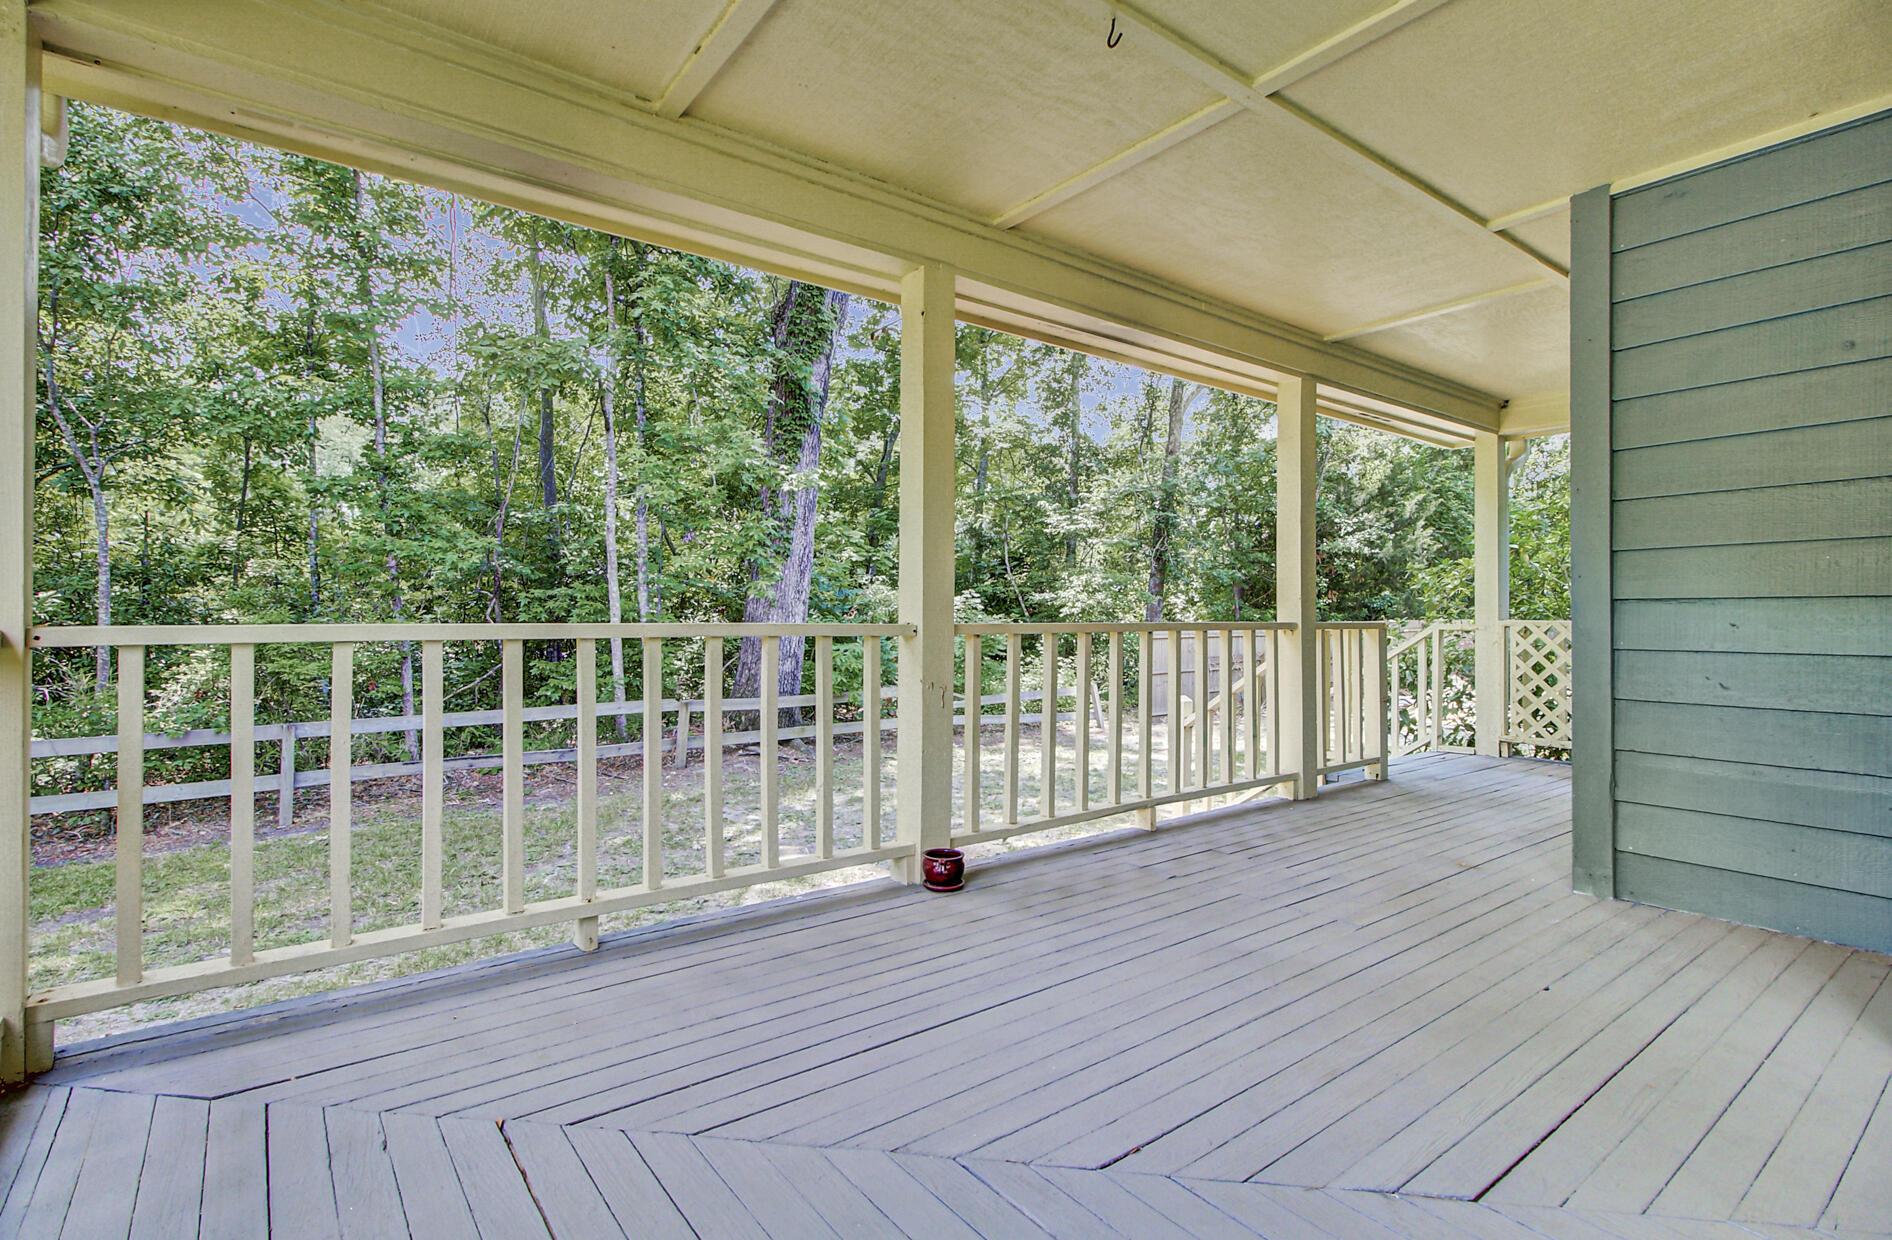 Yaugh Hall Homes For Sale - 1229 Porchers Bluff, Mount Pleasant, SC - 24